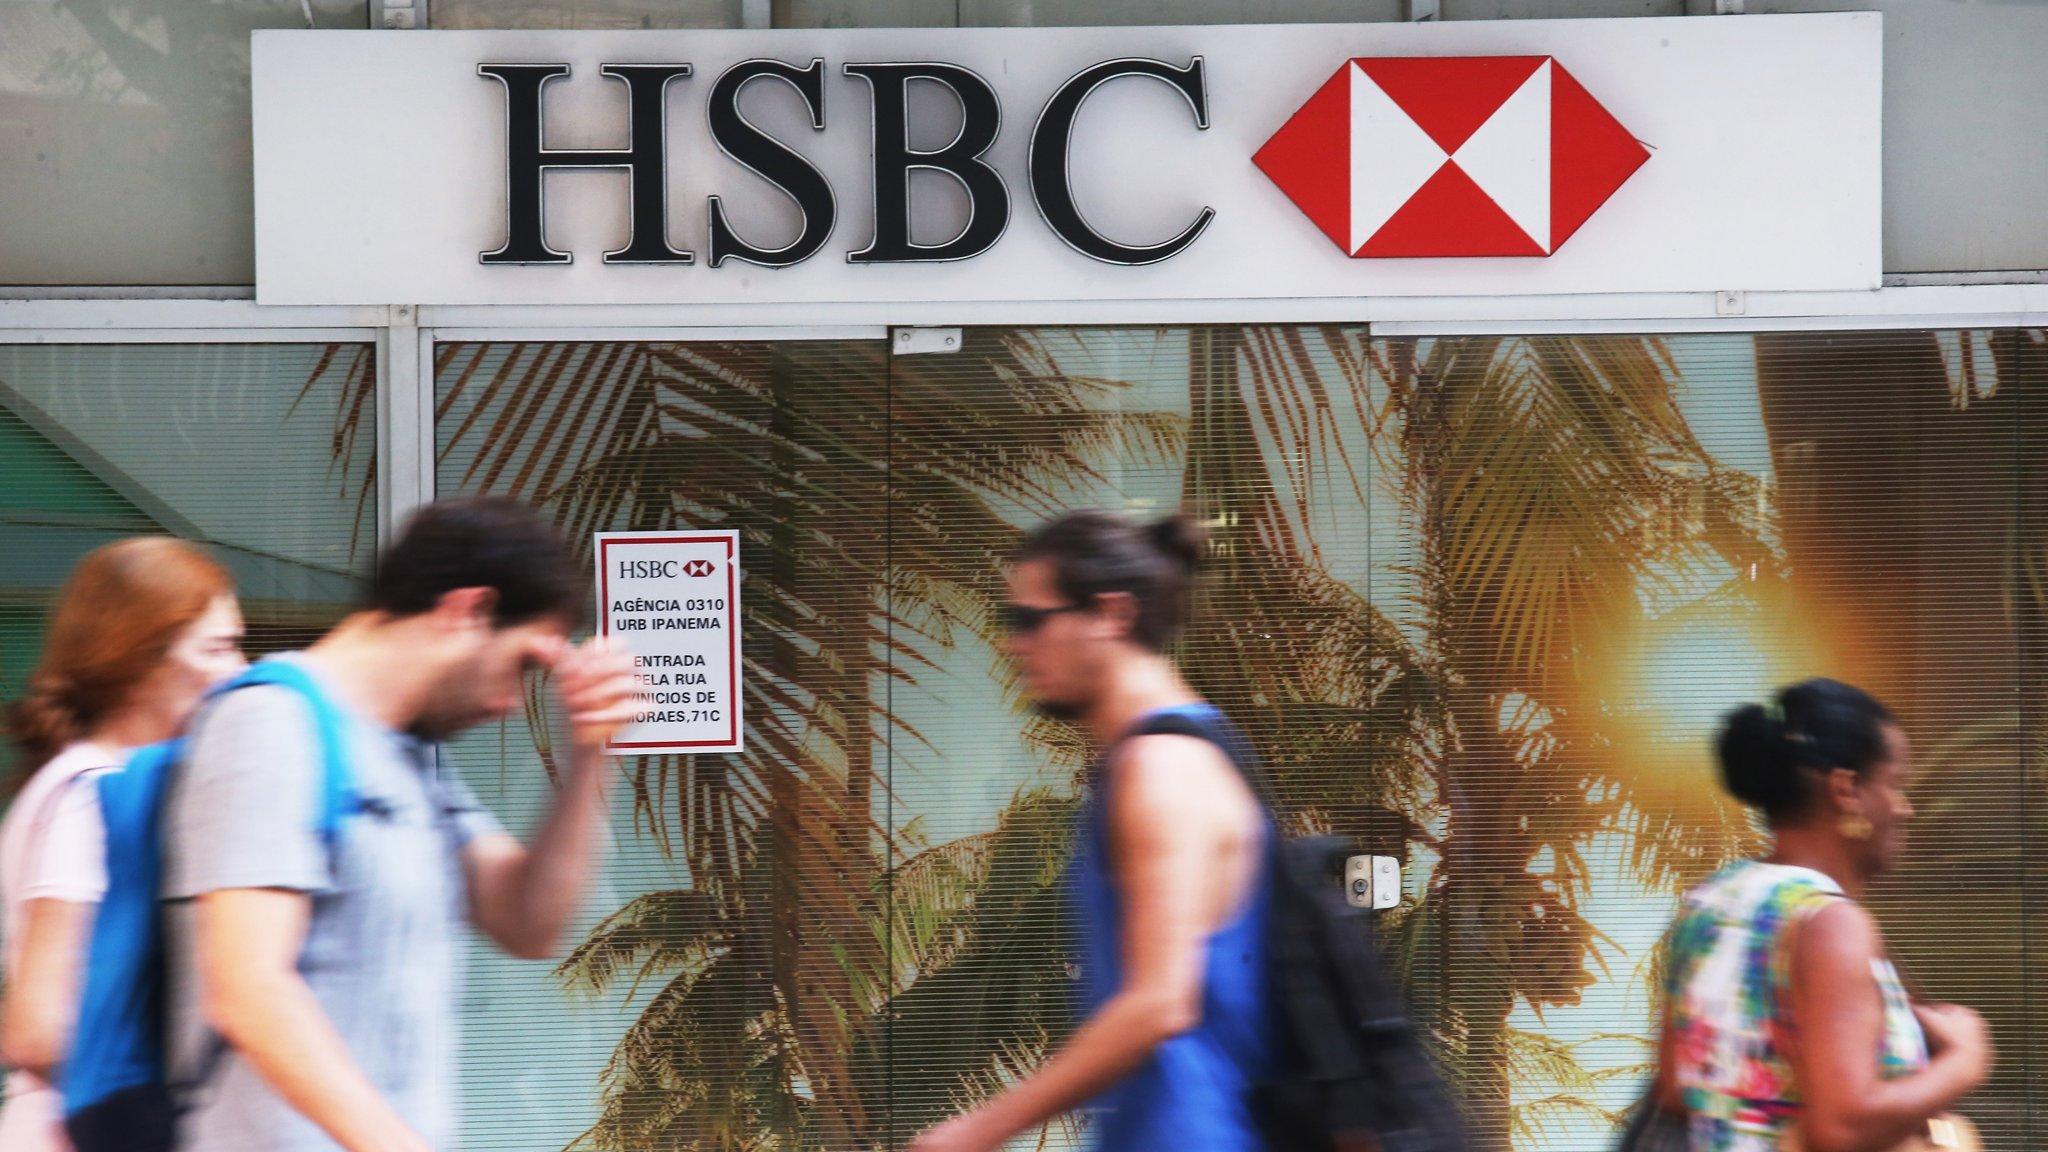 HSBC launches retirement advice service | Financial Times